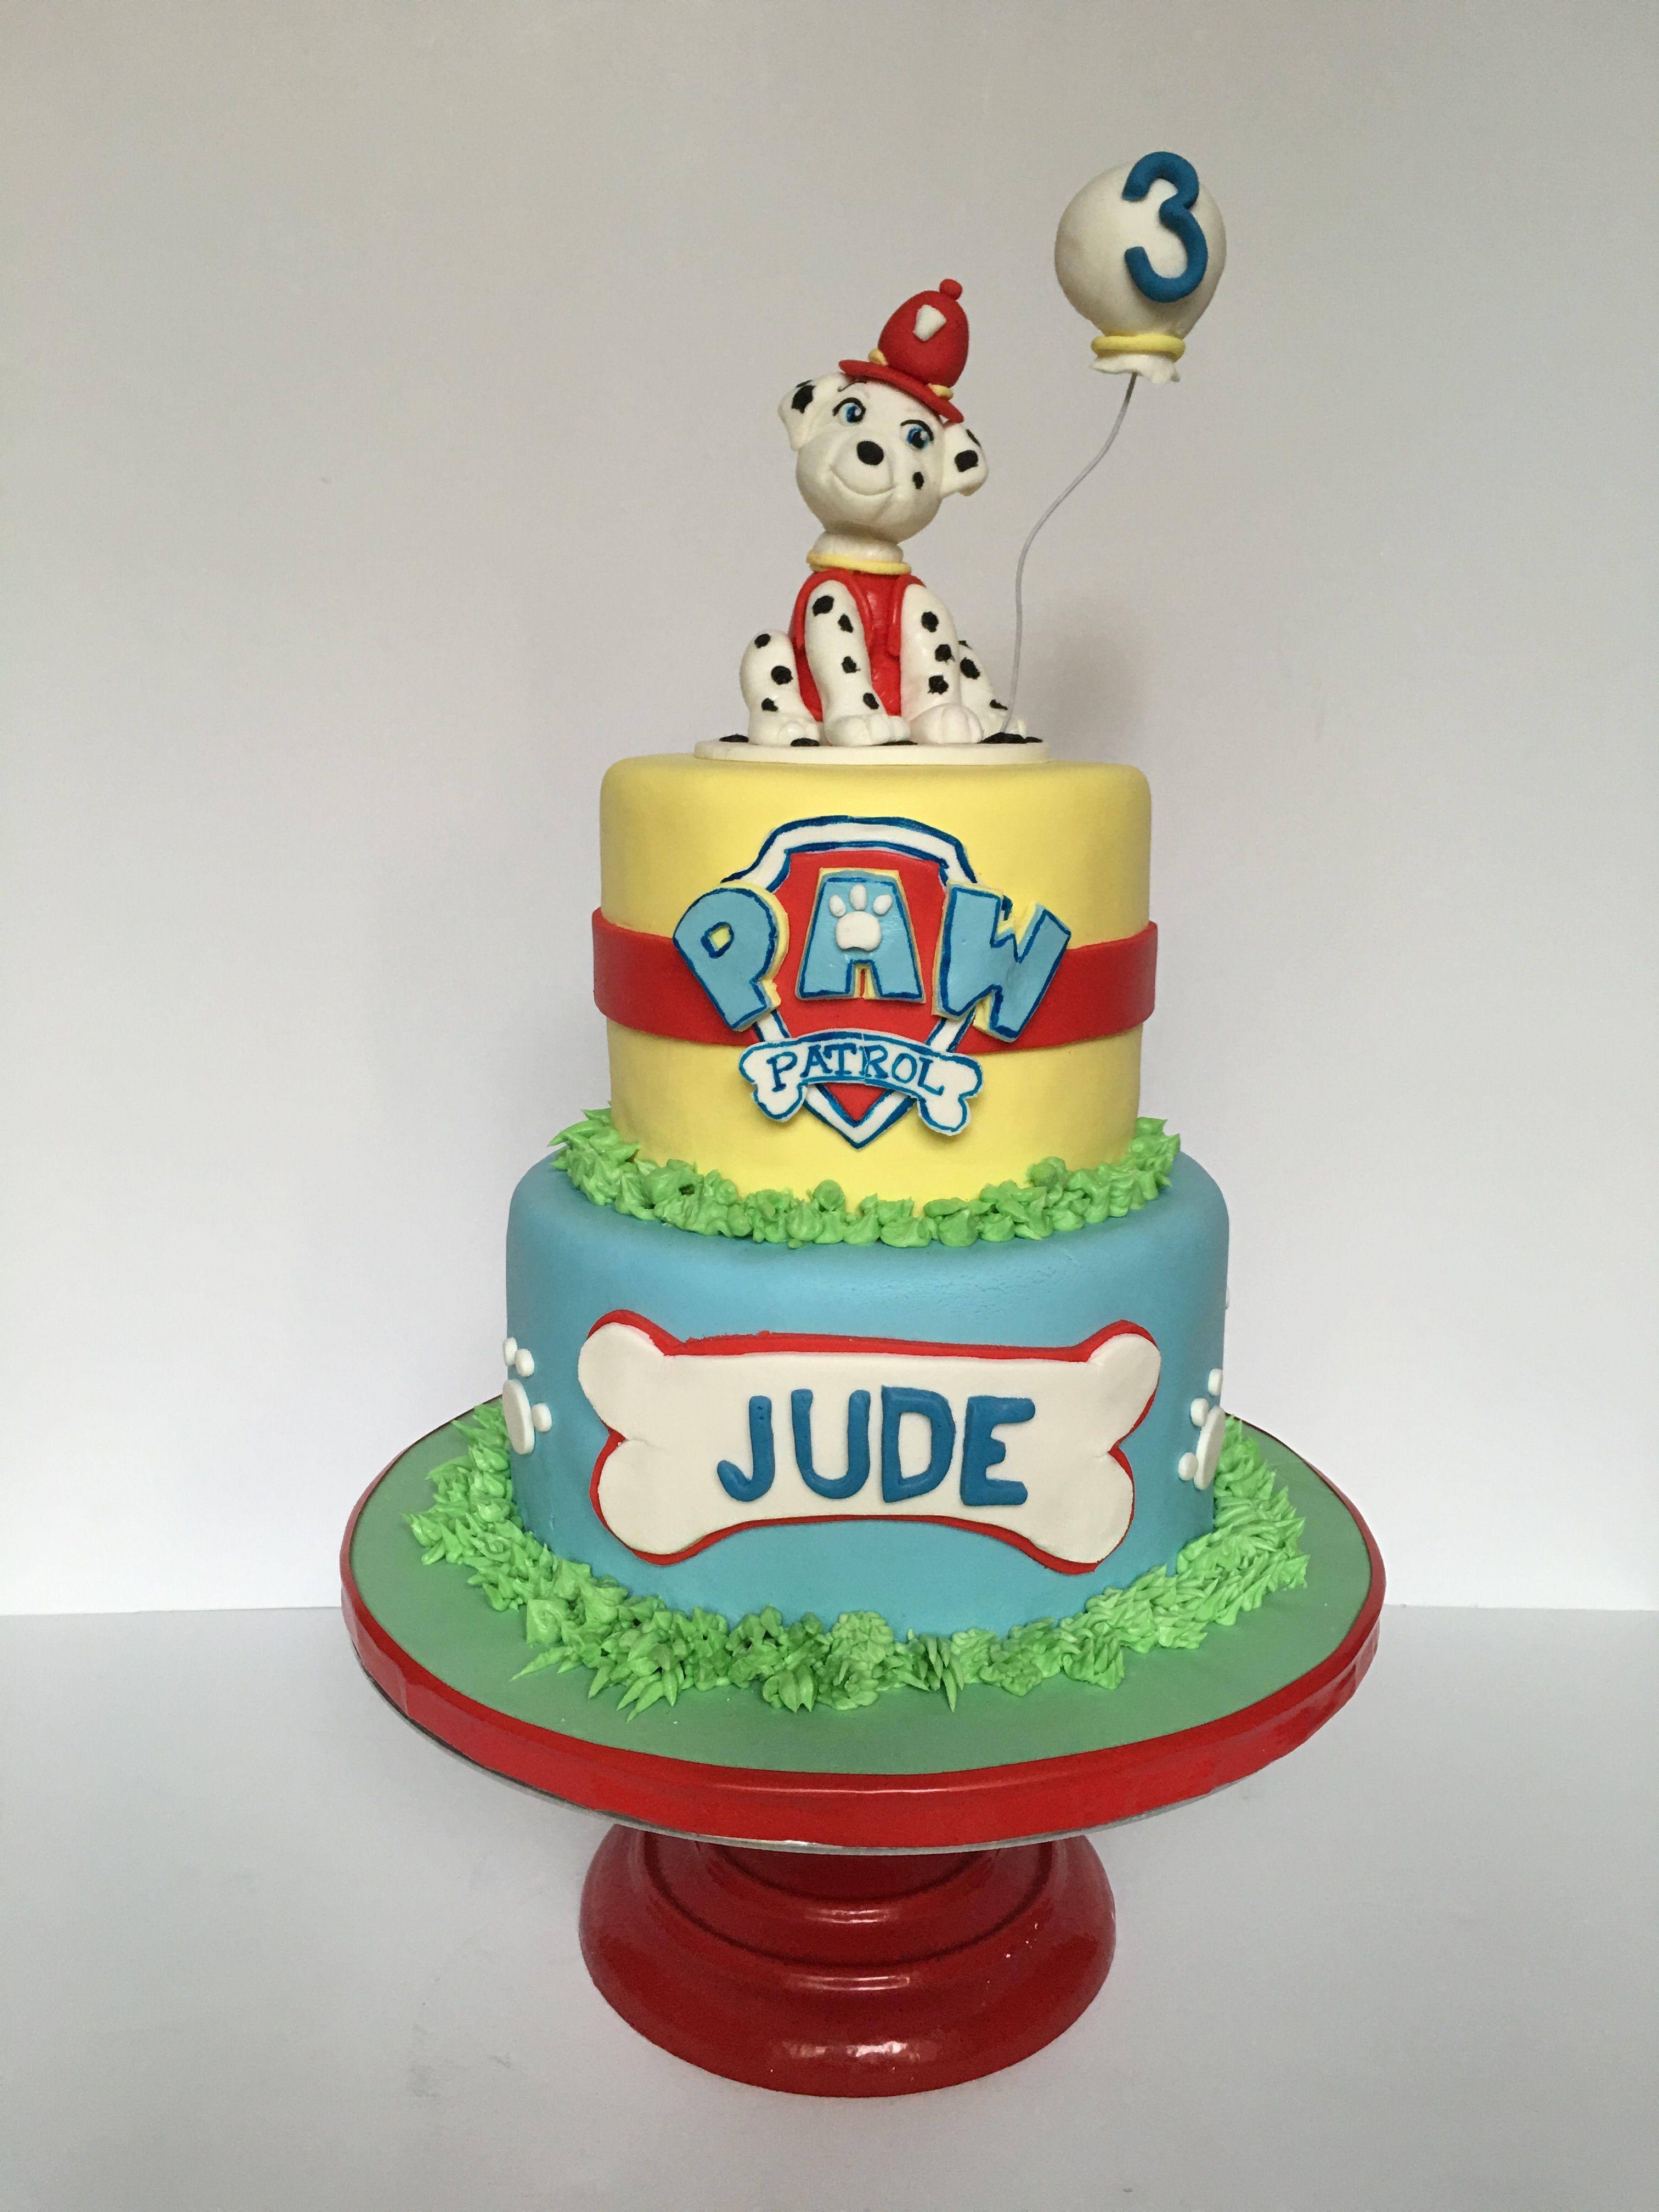 Paw Patrol third birthday cake with Marshall figurine Happy